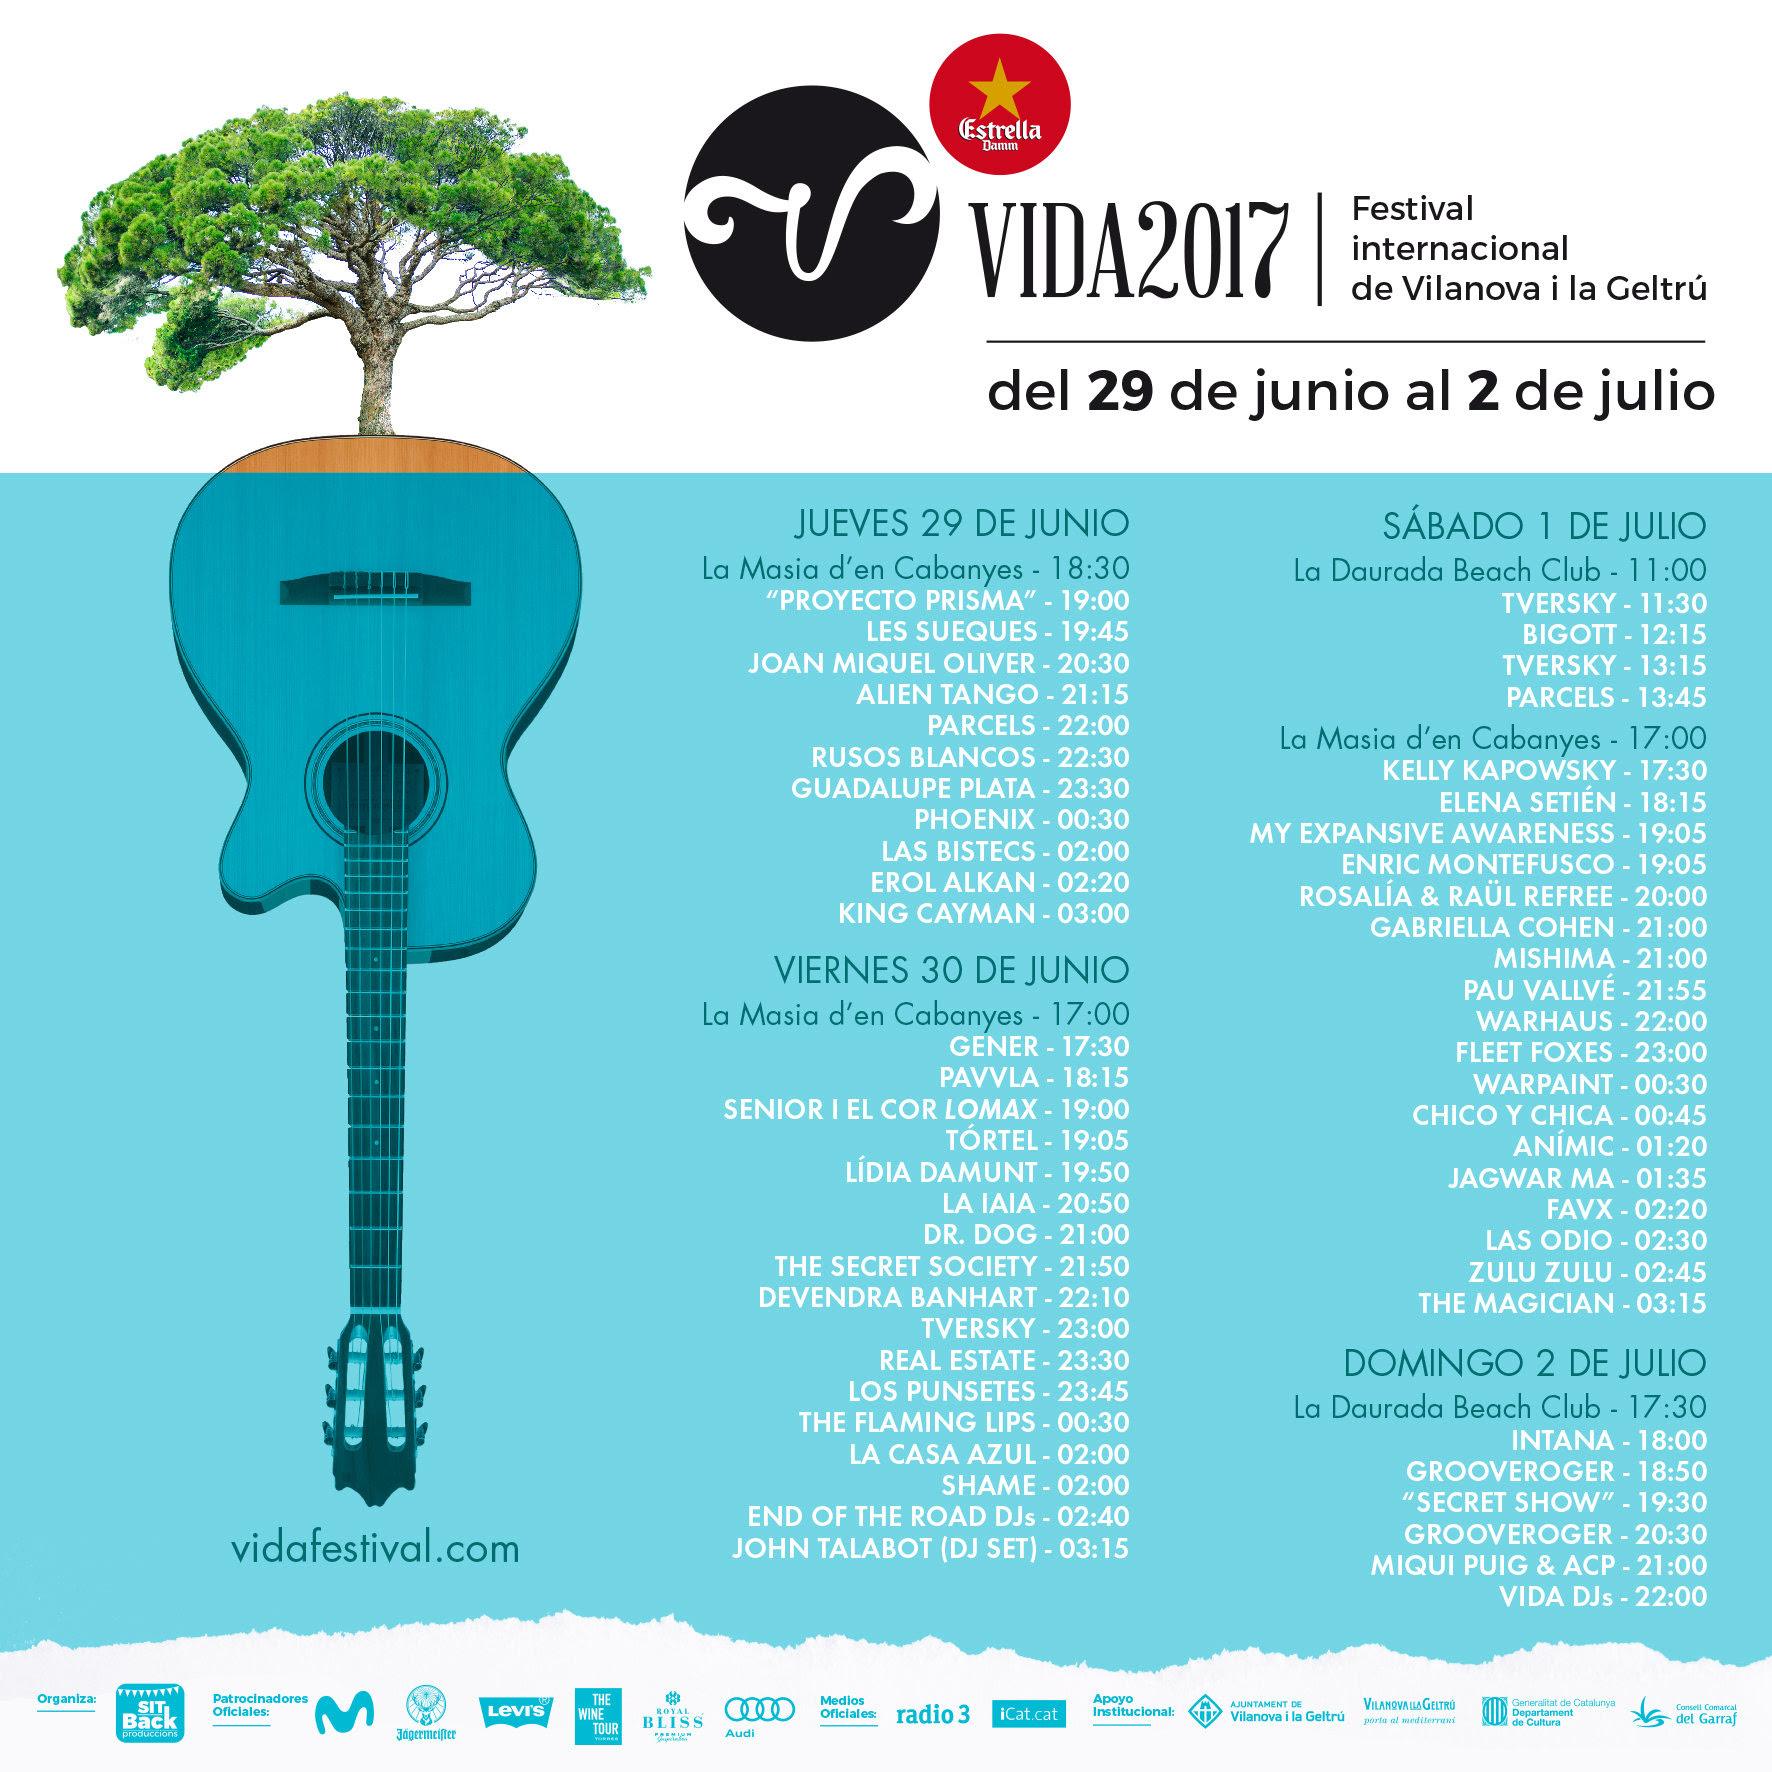 Horarios Vida Festiavl 2017 . Festival internacional de Vilanova i la Geltrù